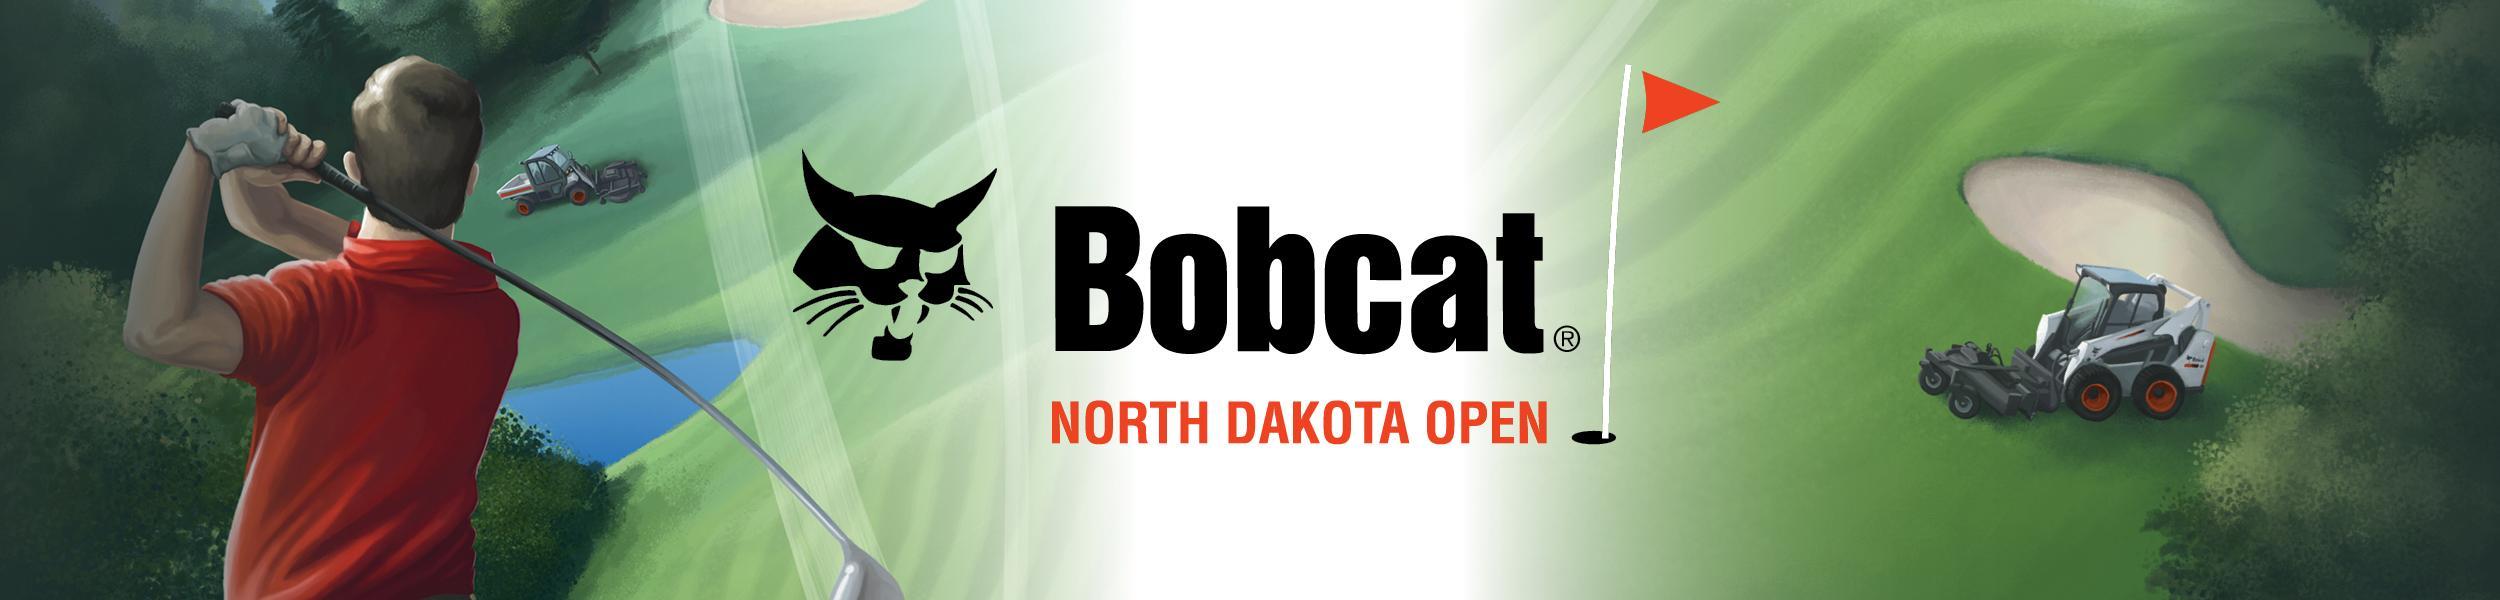 Bobcat North Dakota Open Promotional Image